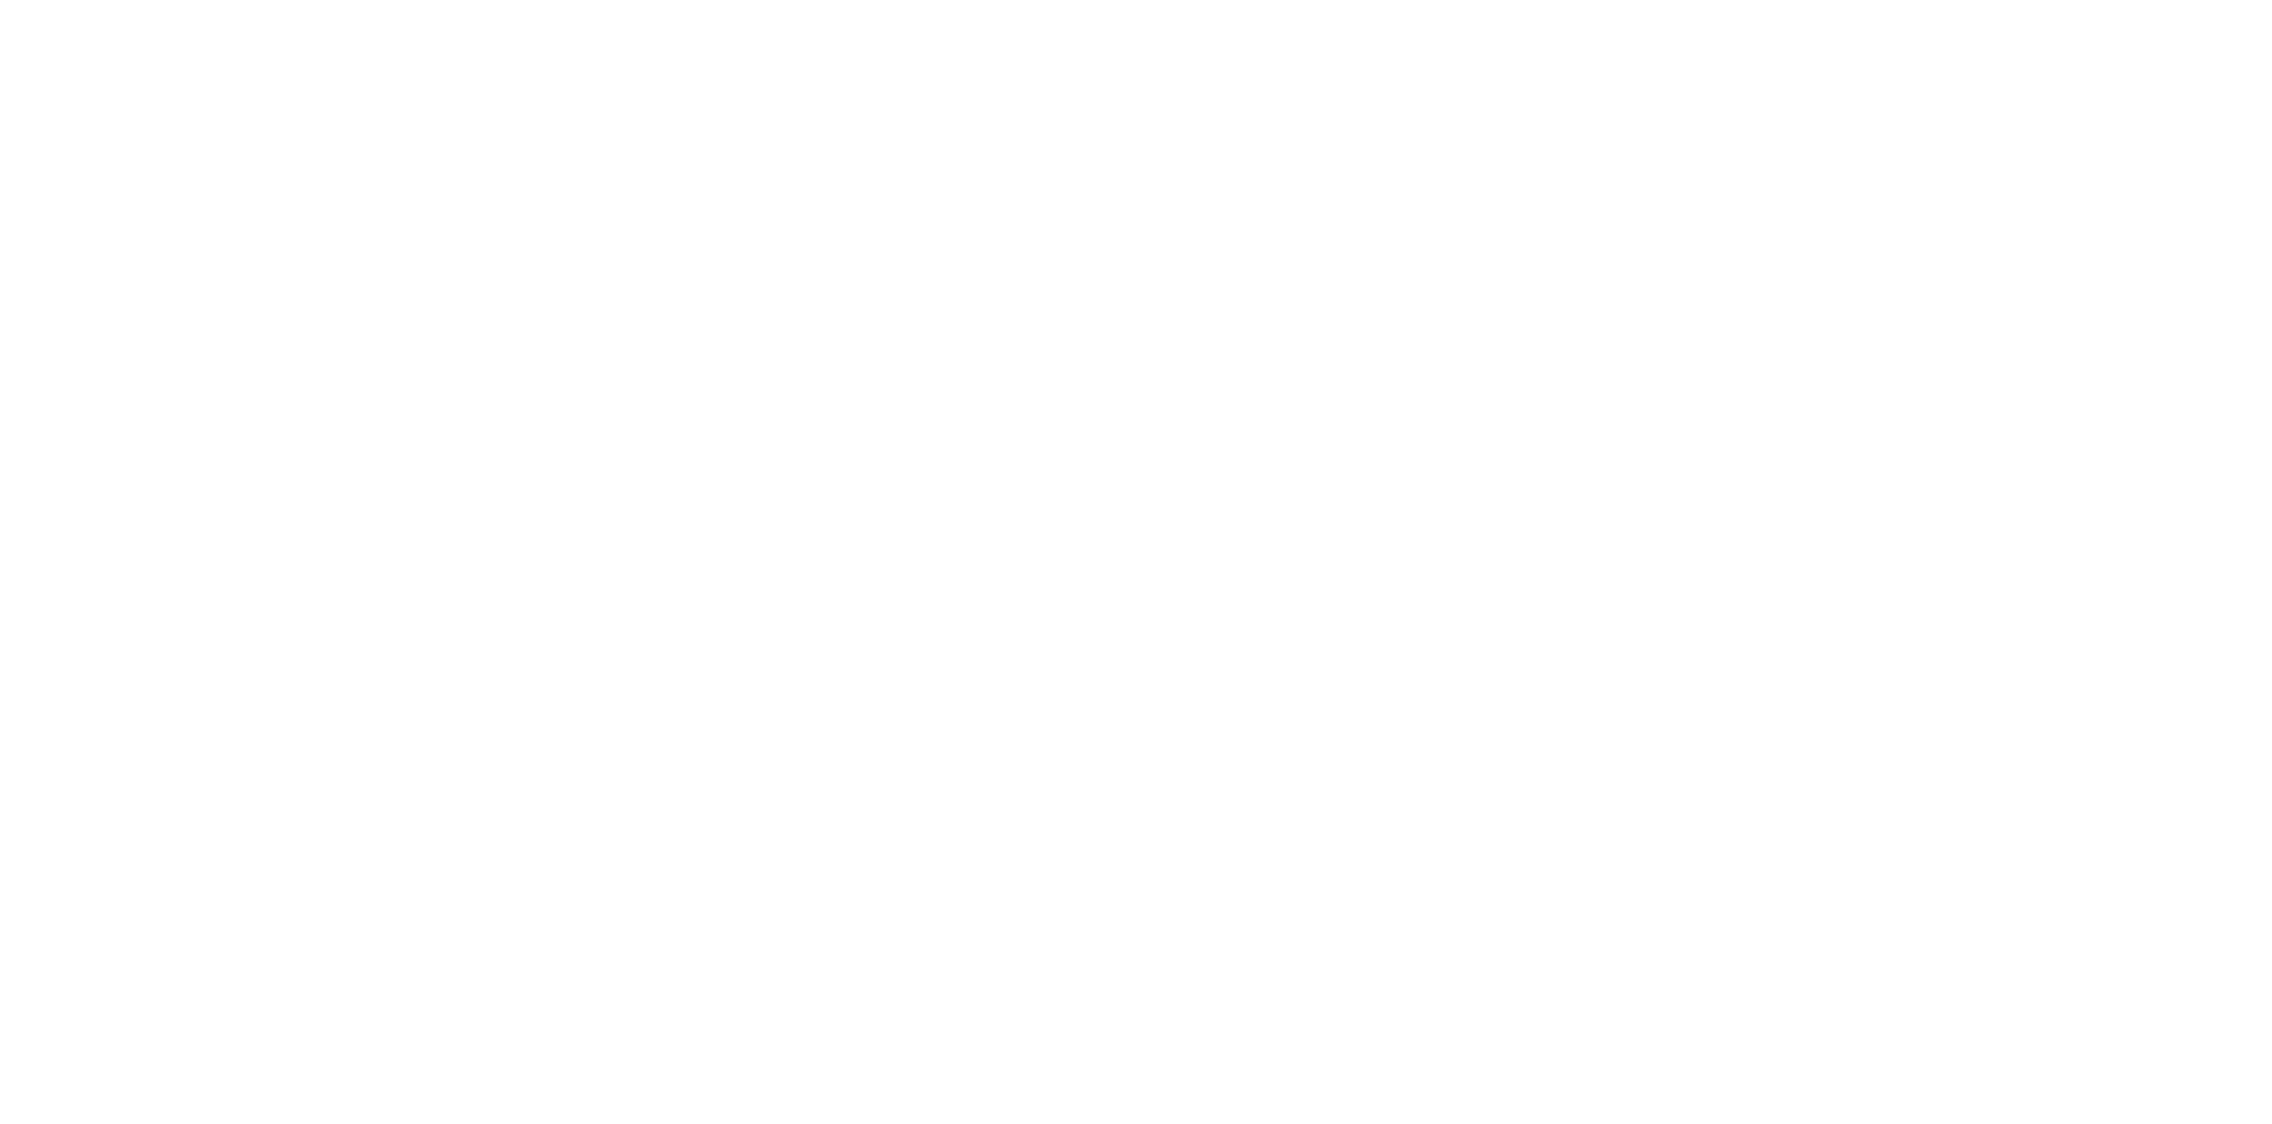 apple_logo_PNG19674 copy.png